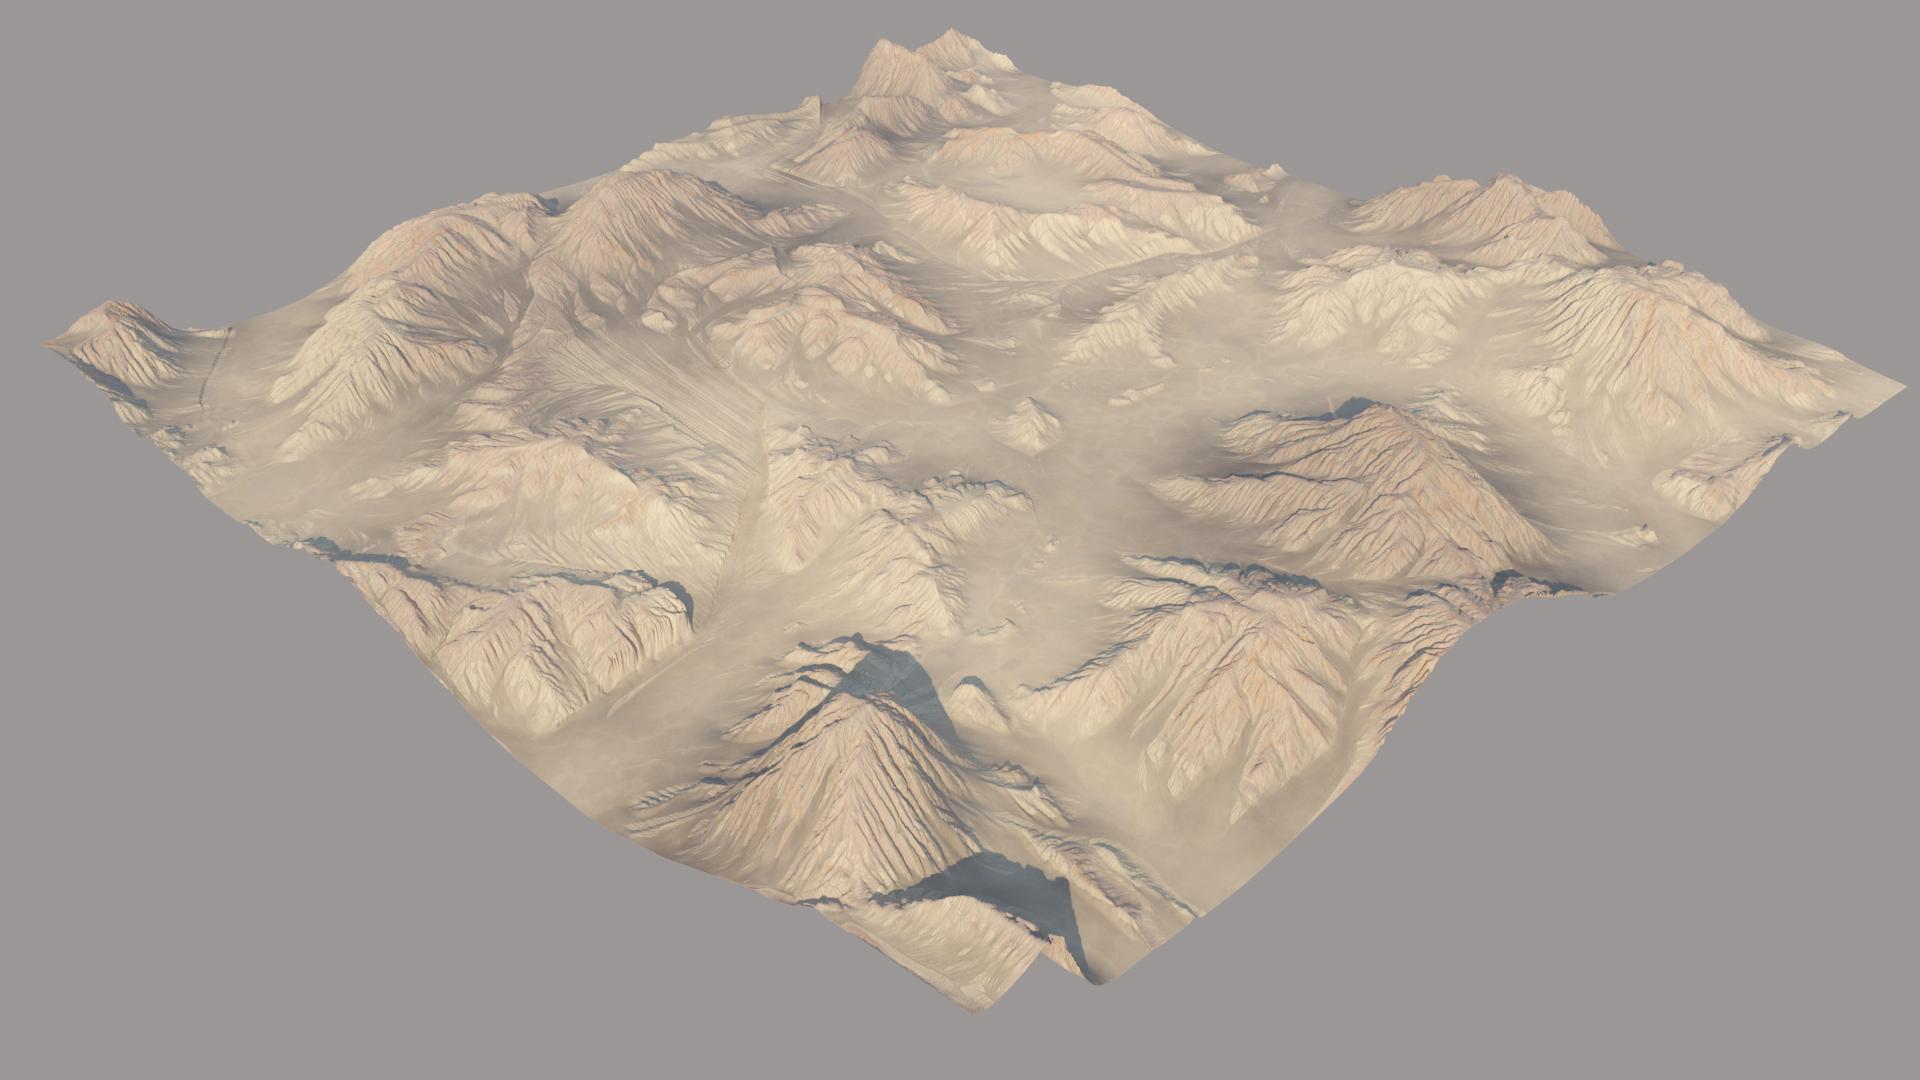 DesertCliffs_04_